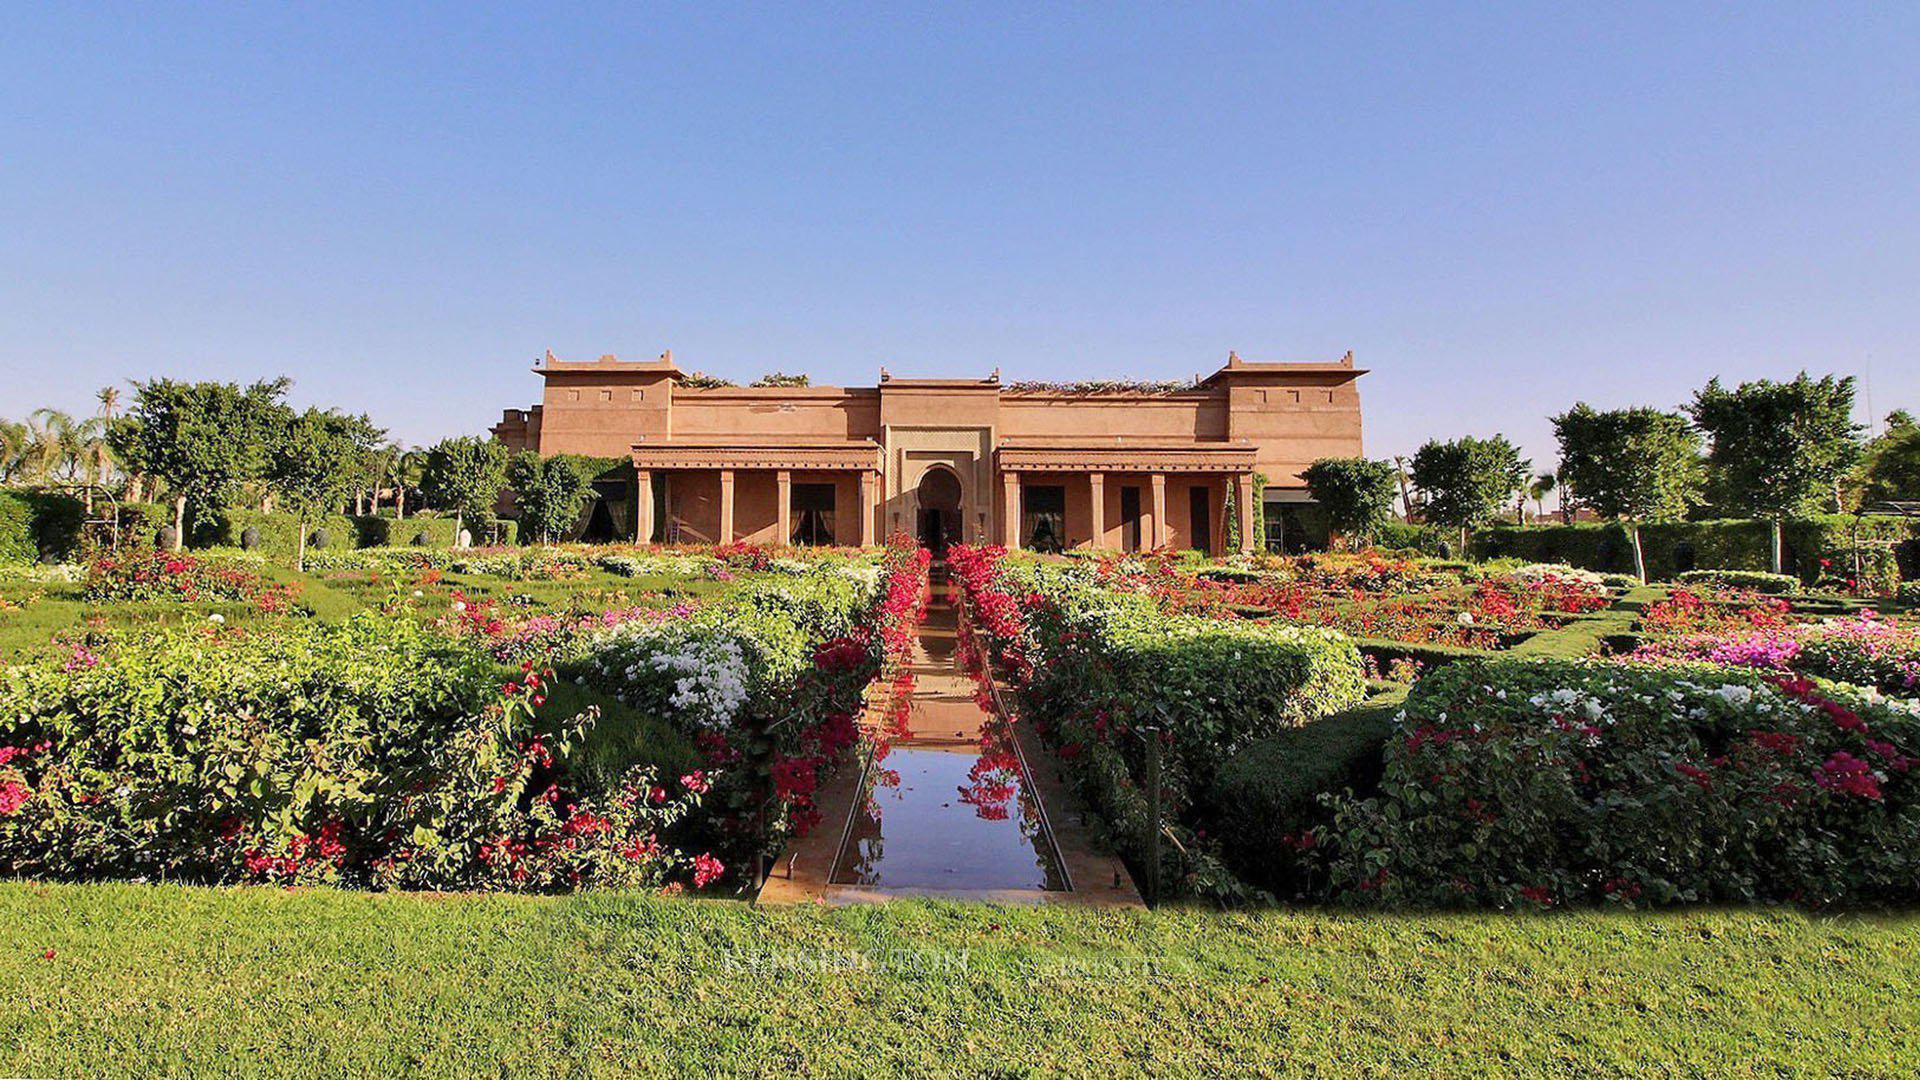 KPPM00912: Palace Granada Luxury Villa Marrakech Morocco